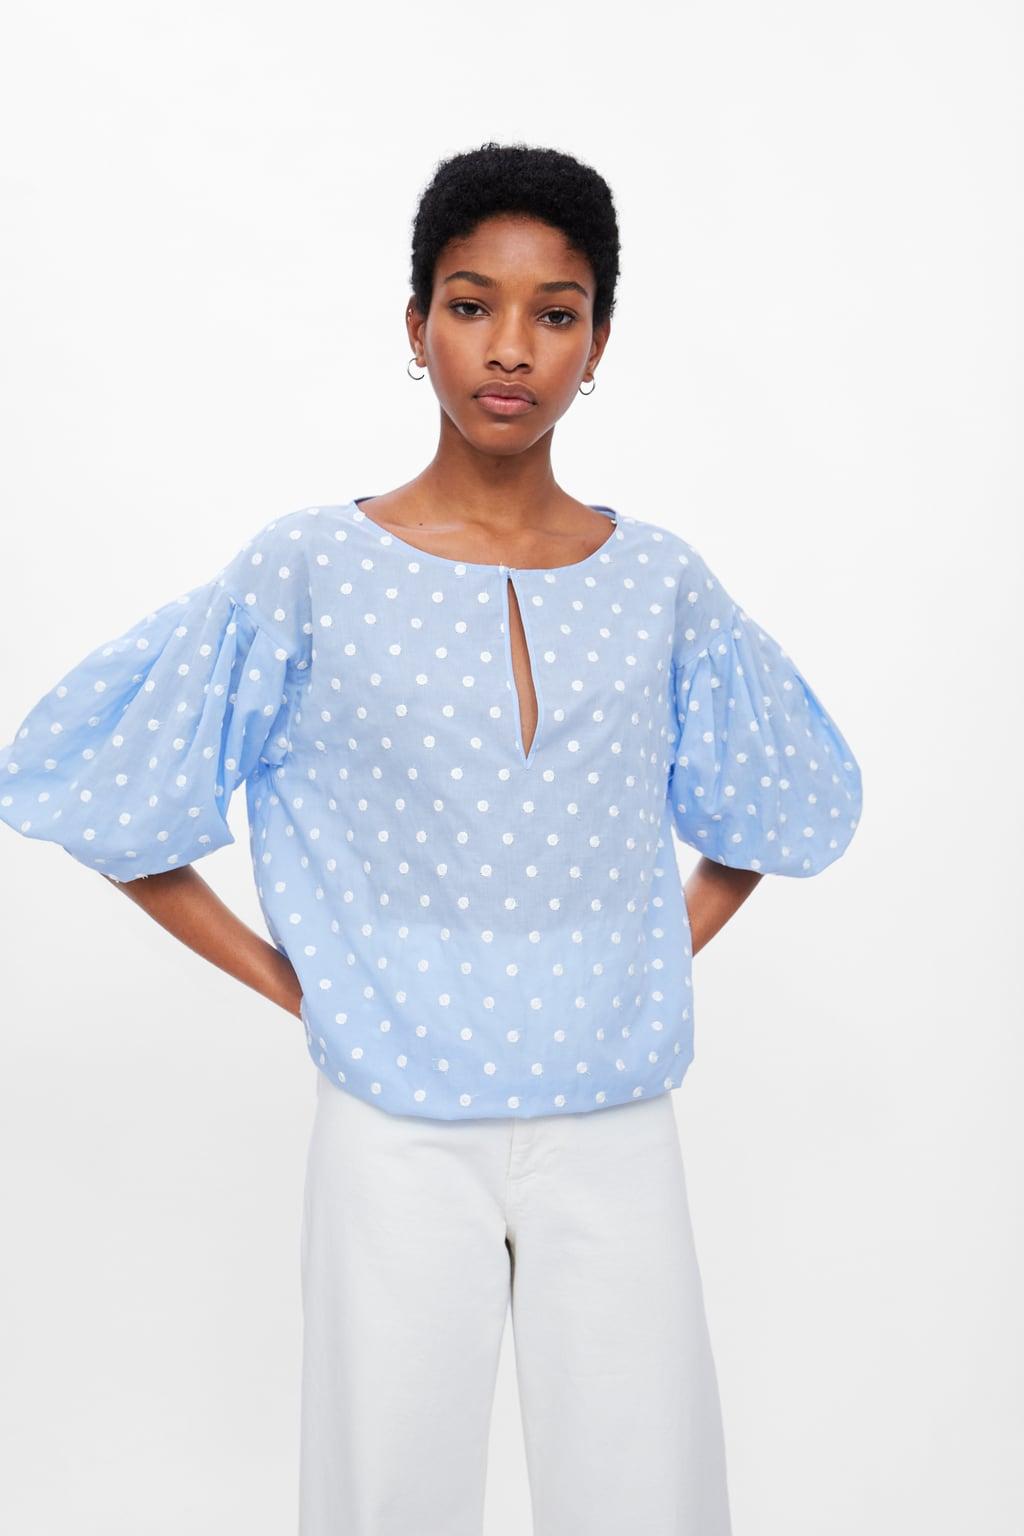 Zara Polka Dot top £12.99